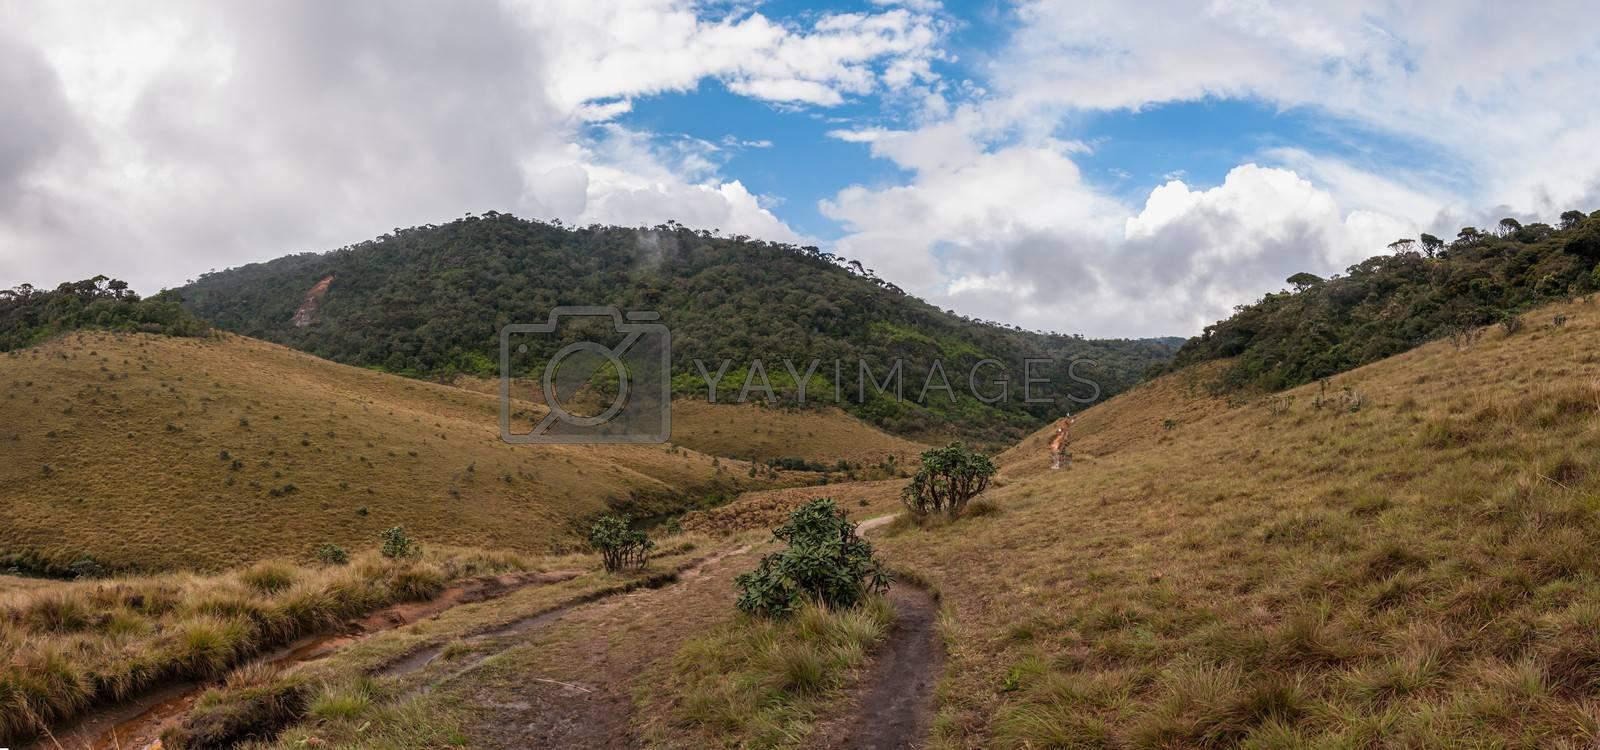 Panorama of Horton Plains in Sri Lanka.